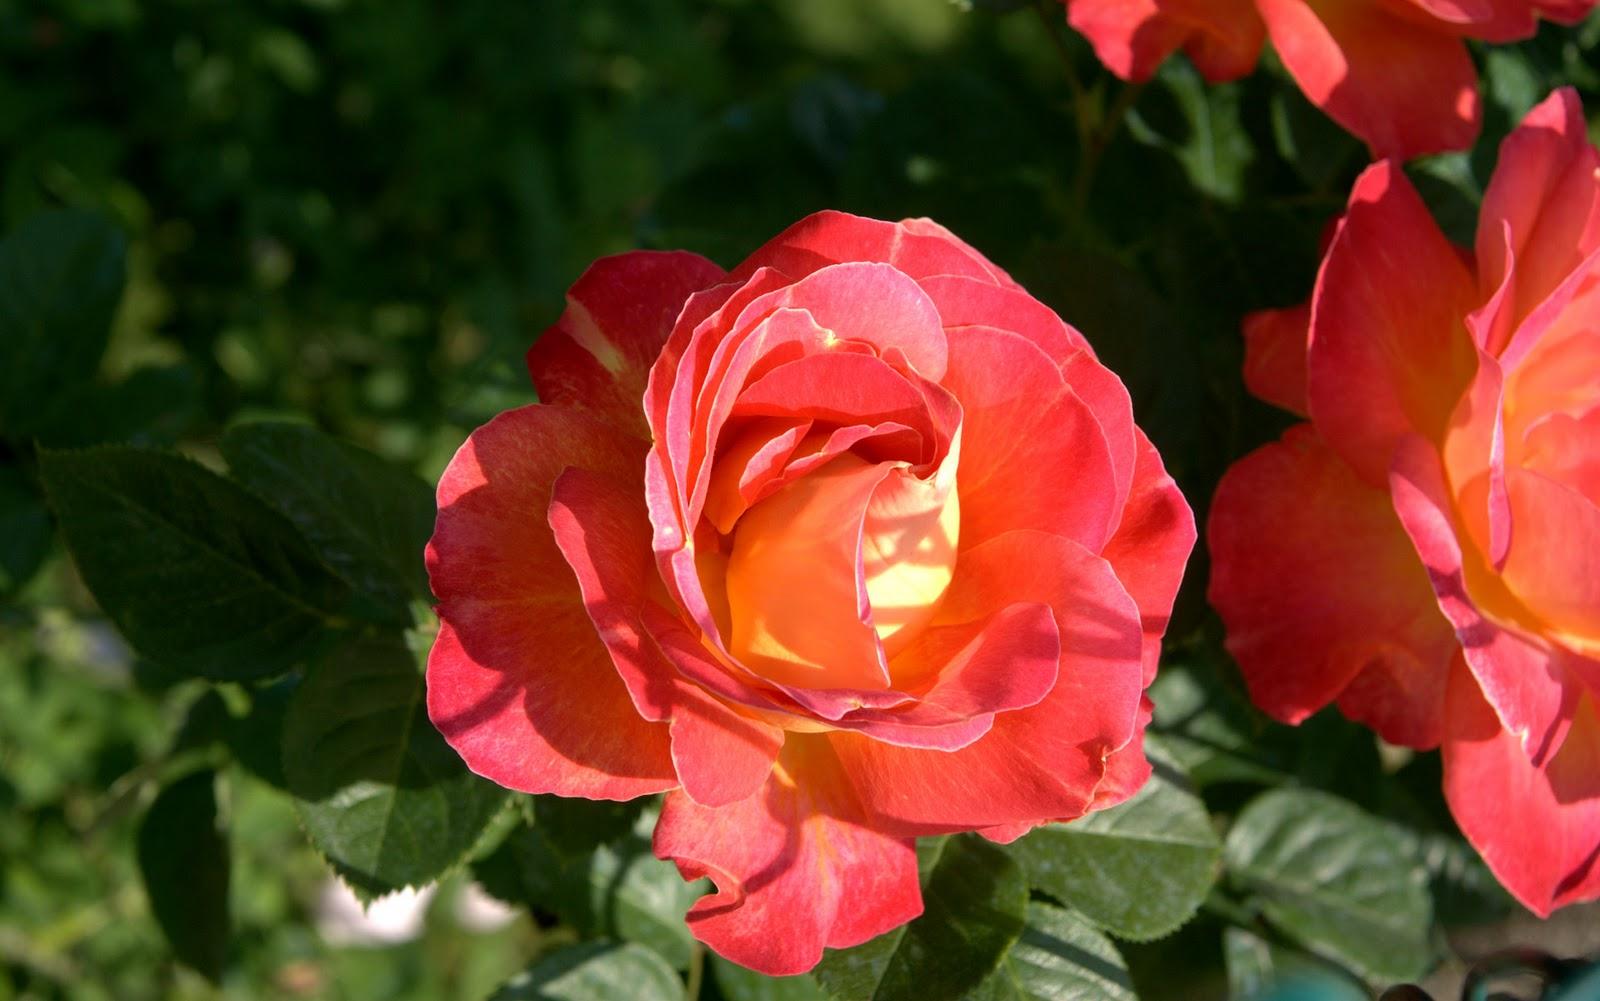 http://3.bp.blogspot.com/-xSFRon7g738/TtRc6rWewWI/AAAAAAAAAB4/dpNoifPRG34/s1600/amazing-crimson-rose-1920x1200-hd-wallpaper-photo-fabiovisentincom-dsc09558-3.jpg